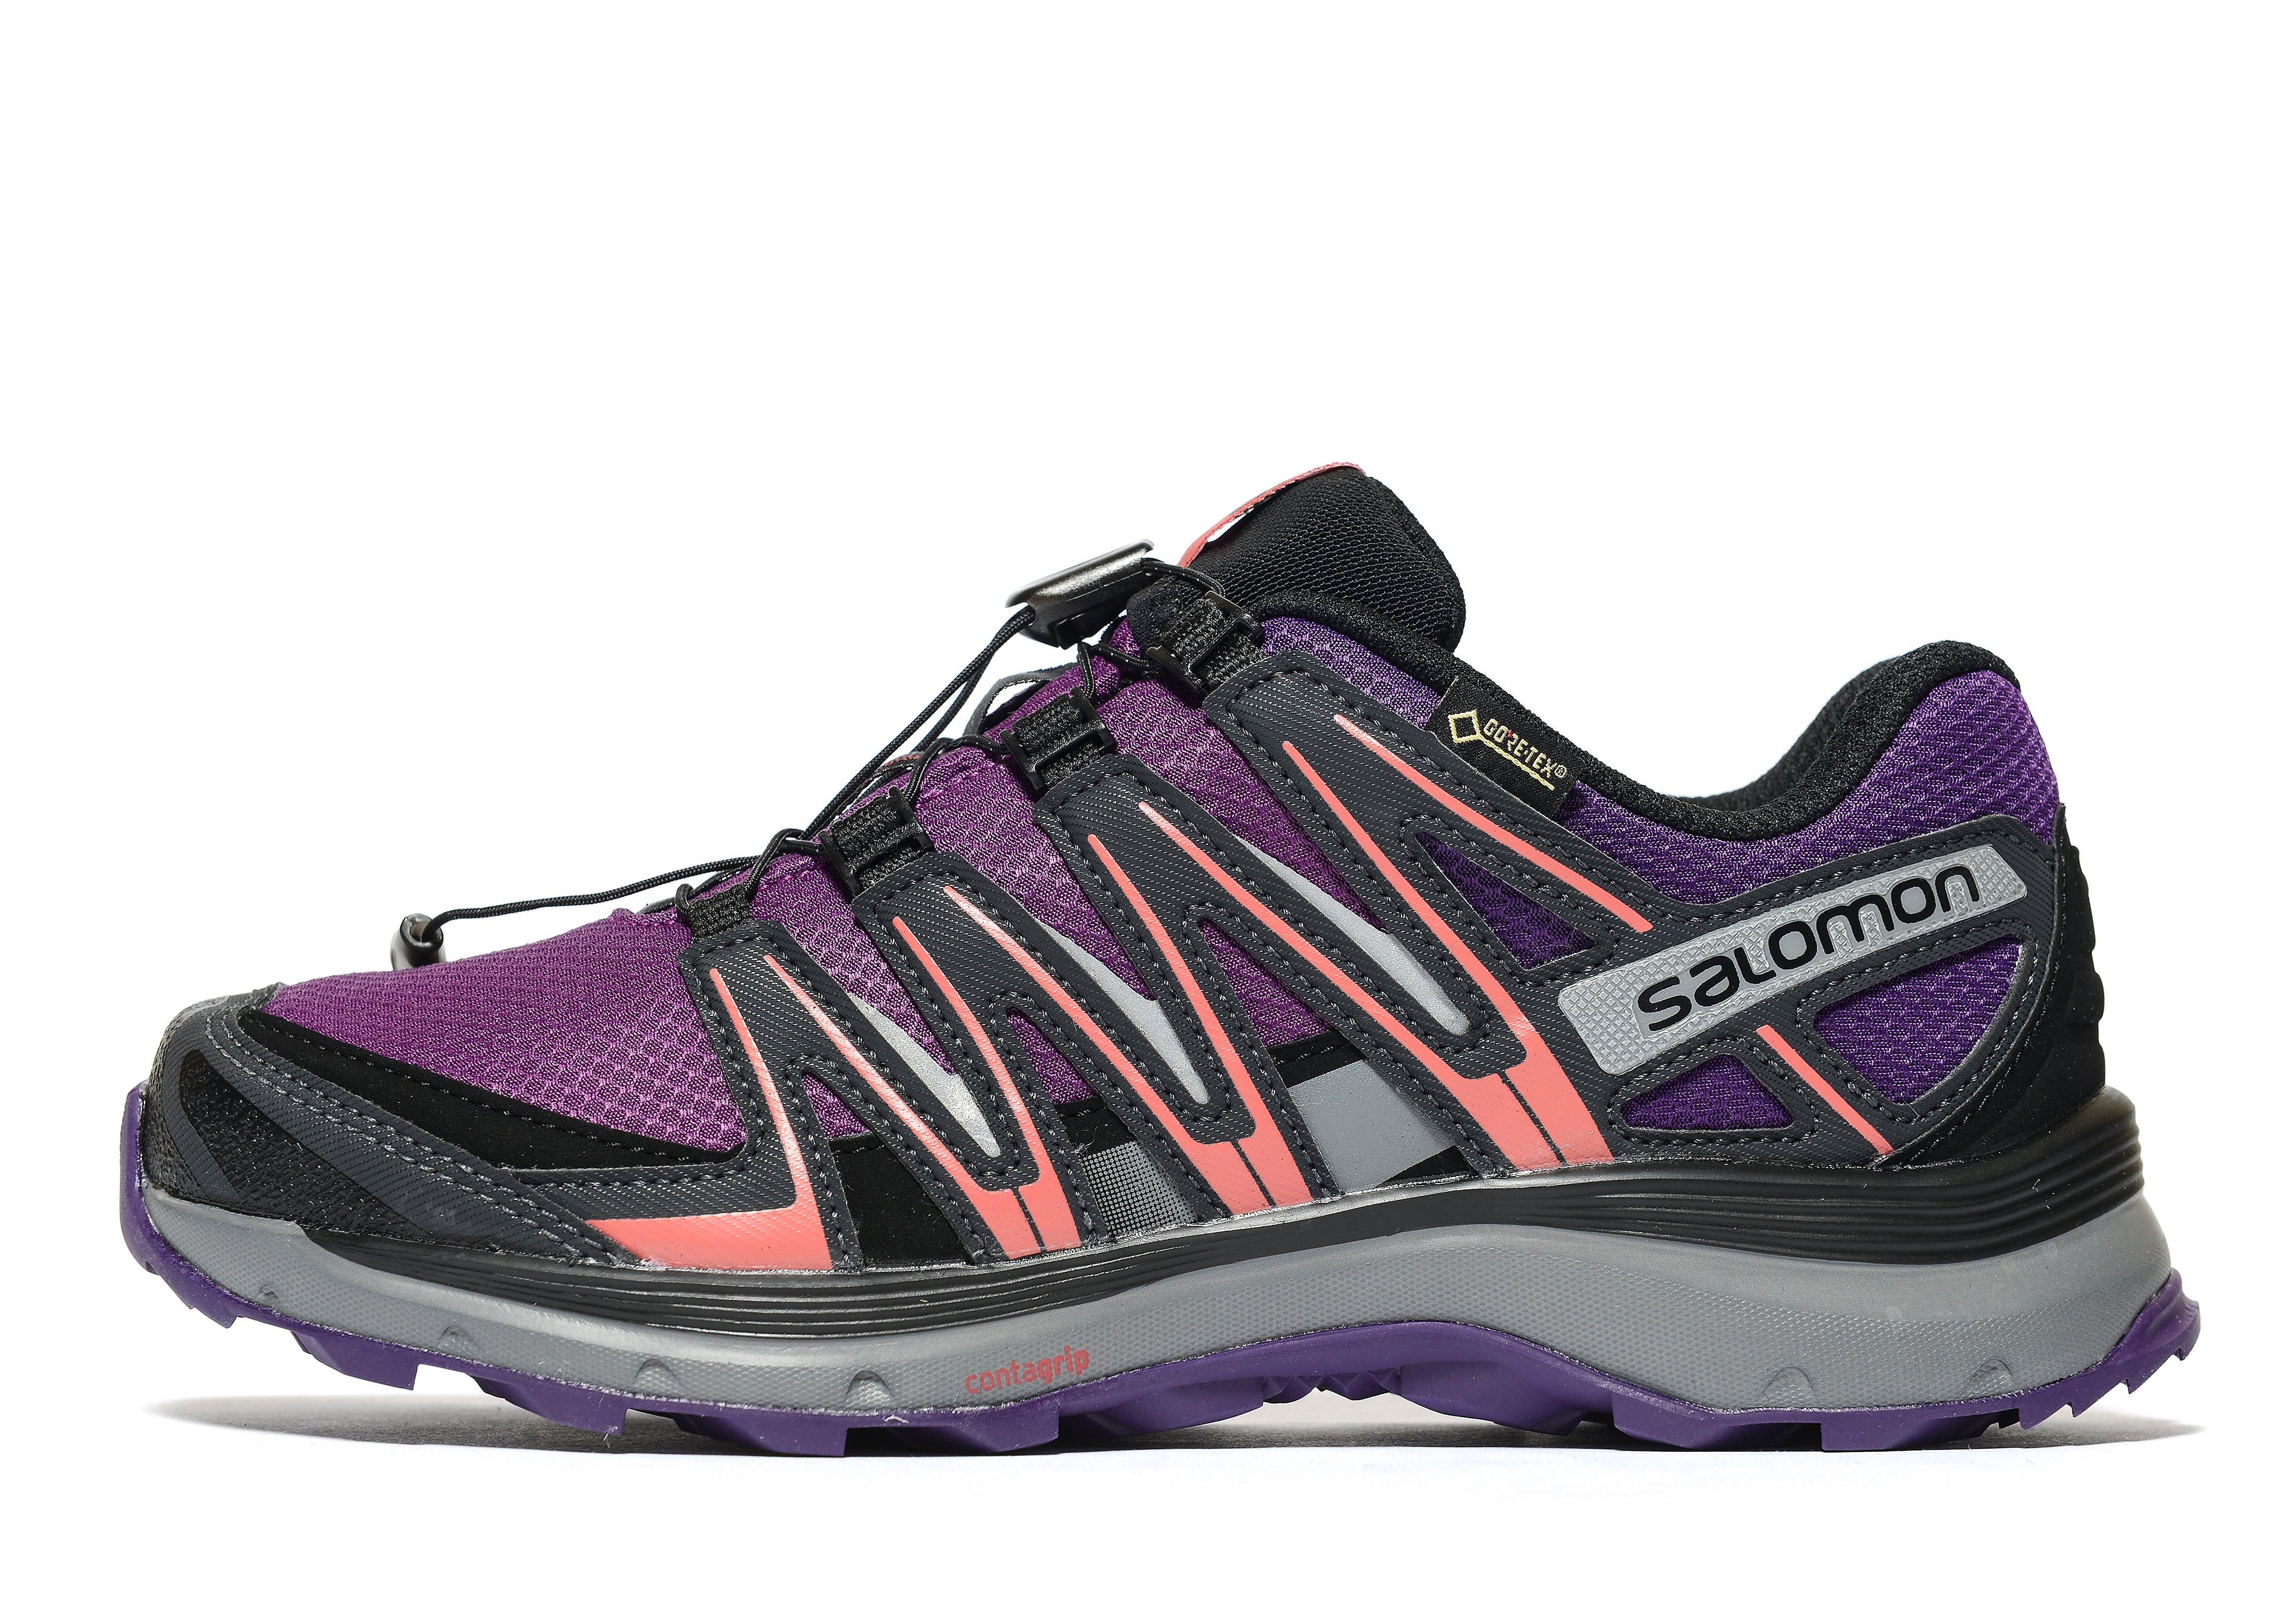 Salomon XA Lite GTX Trail Running Shoes Women's